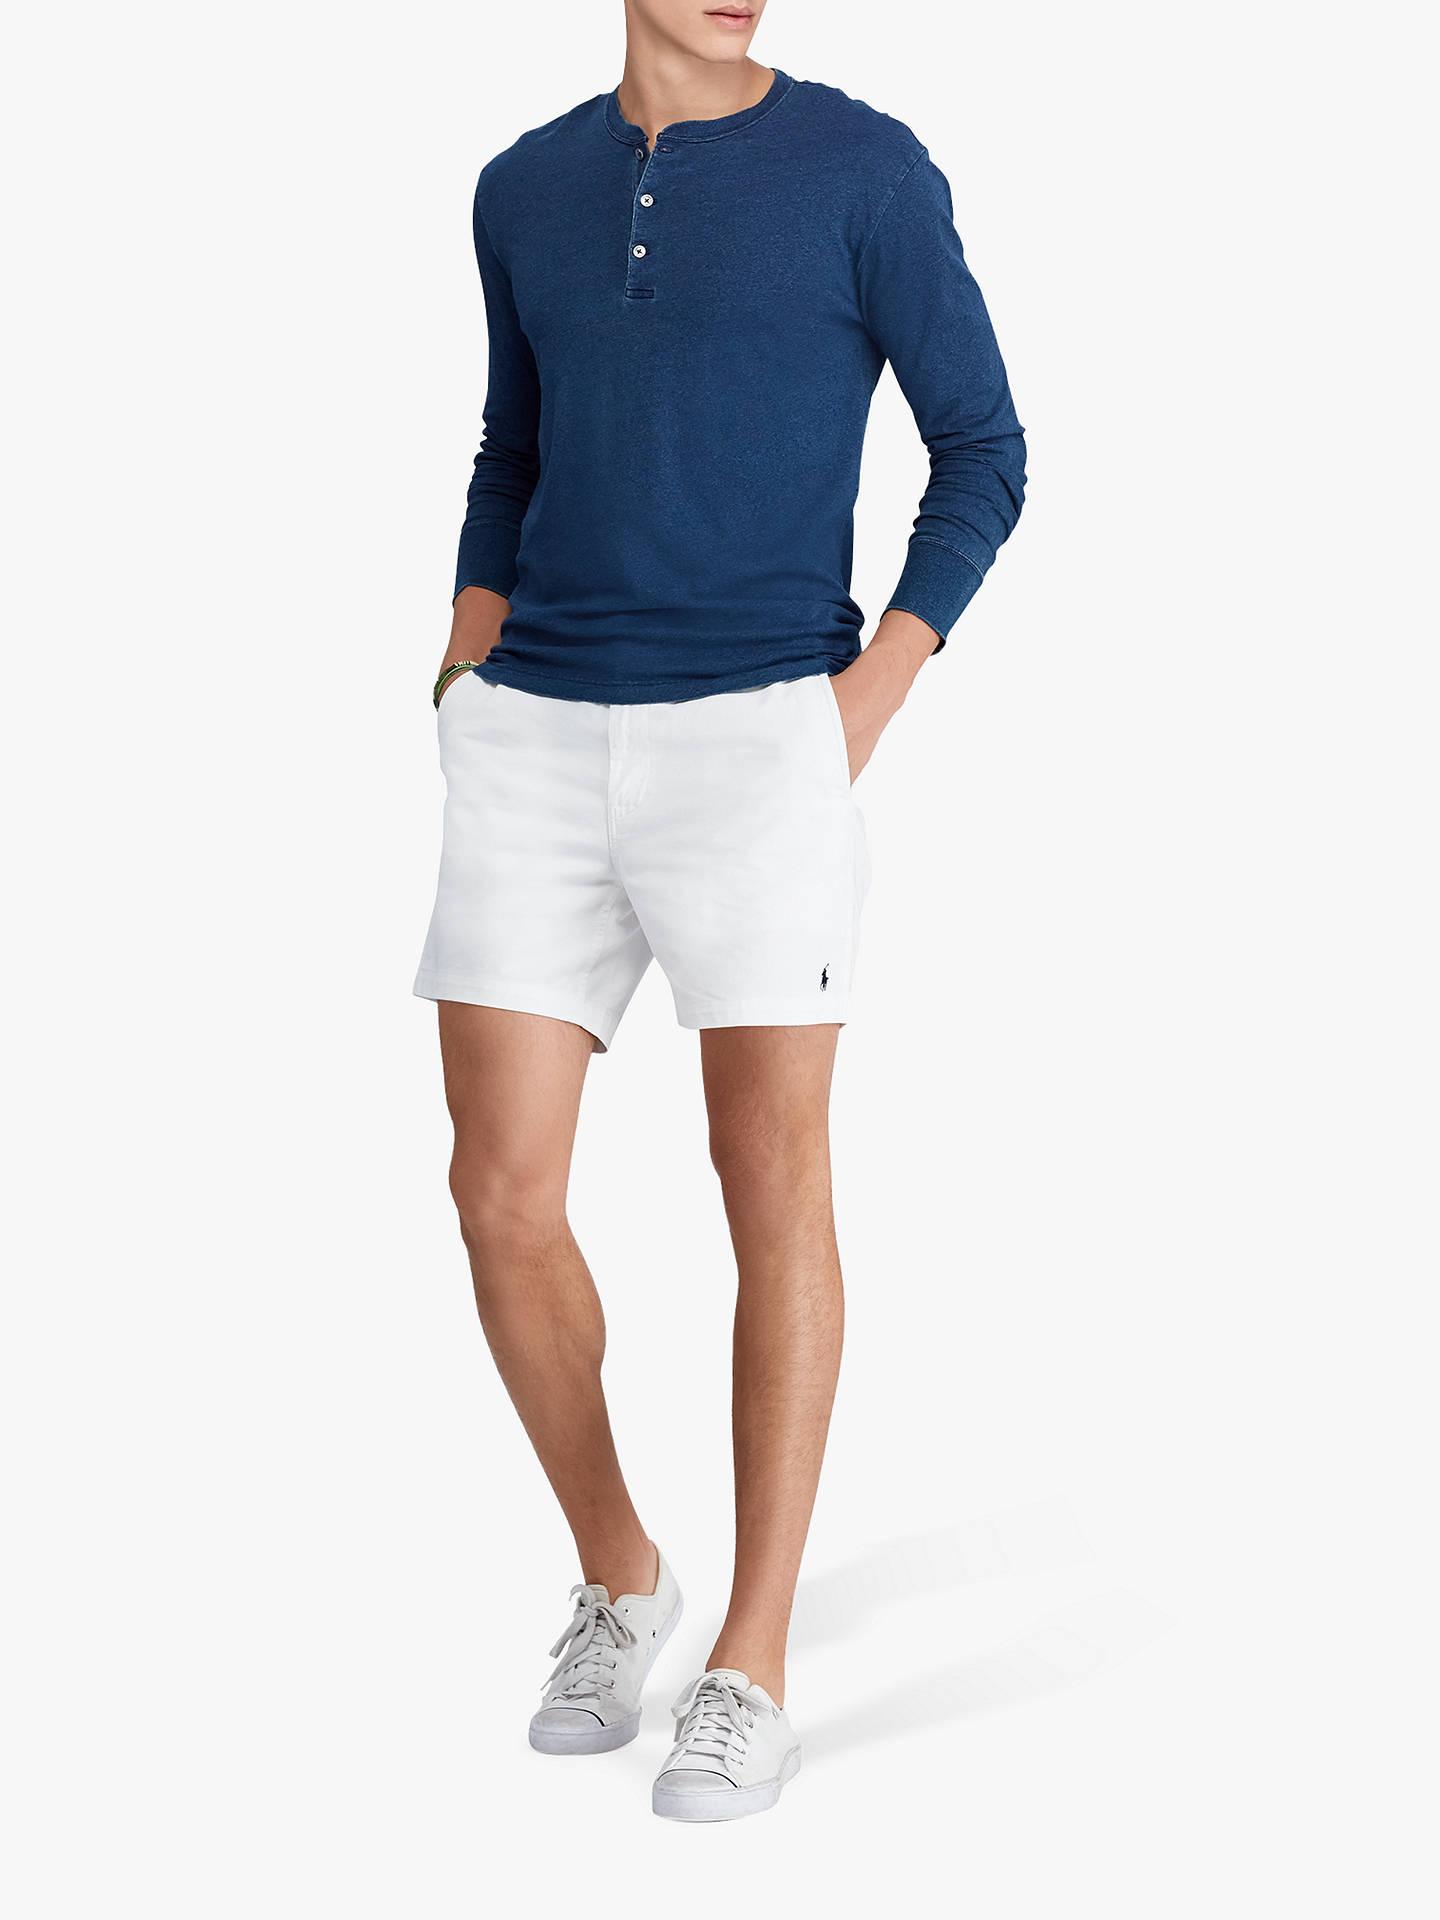 Polo Shorts John At Lewisamp; Partners Prepster Ralph Lauren Flat trhQds